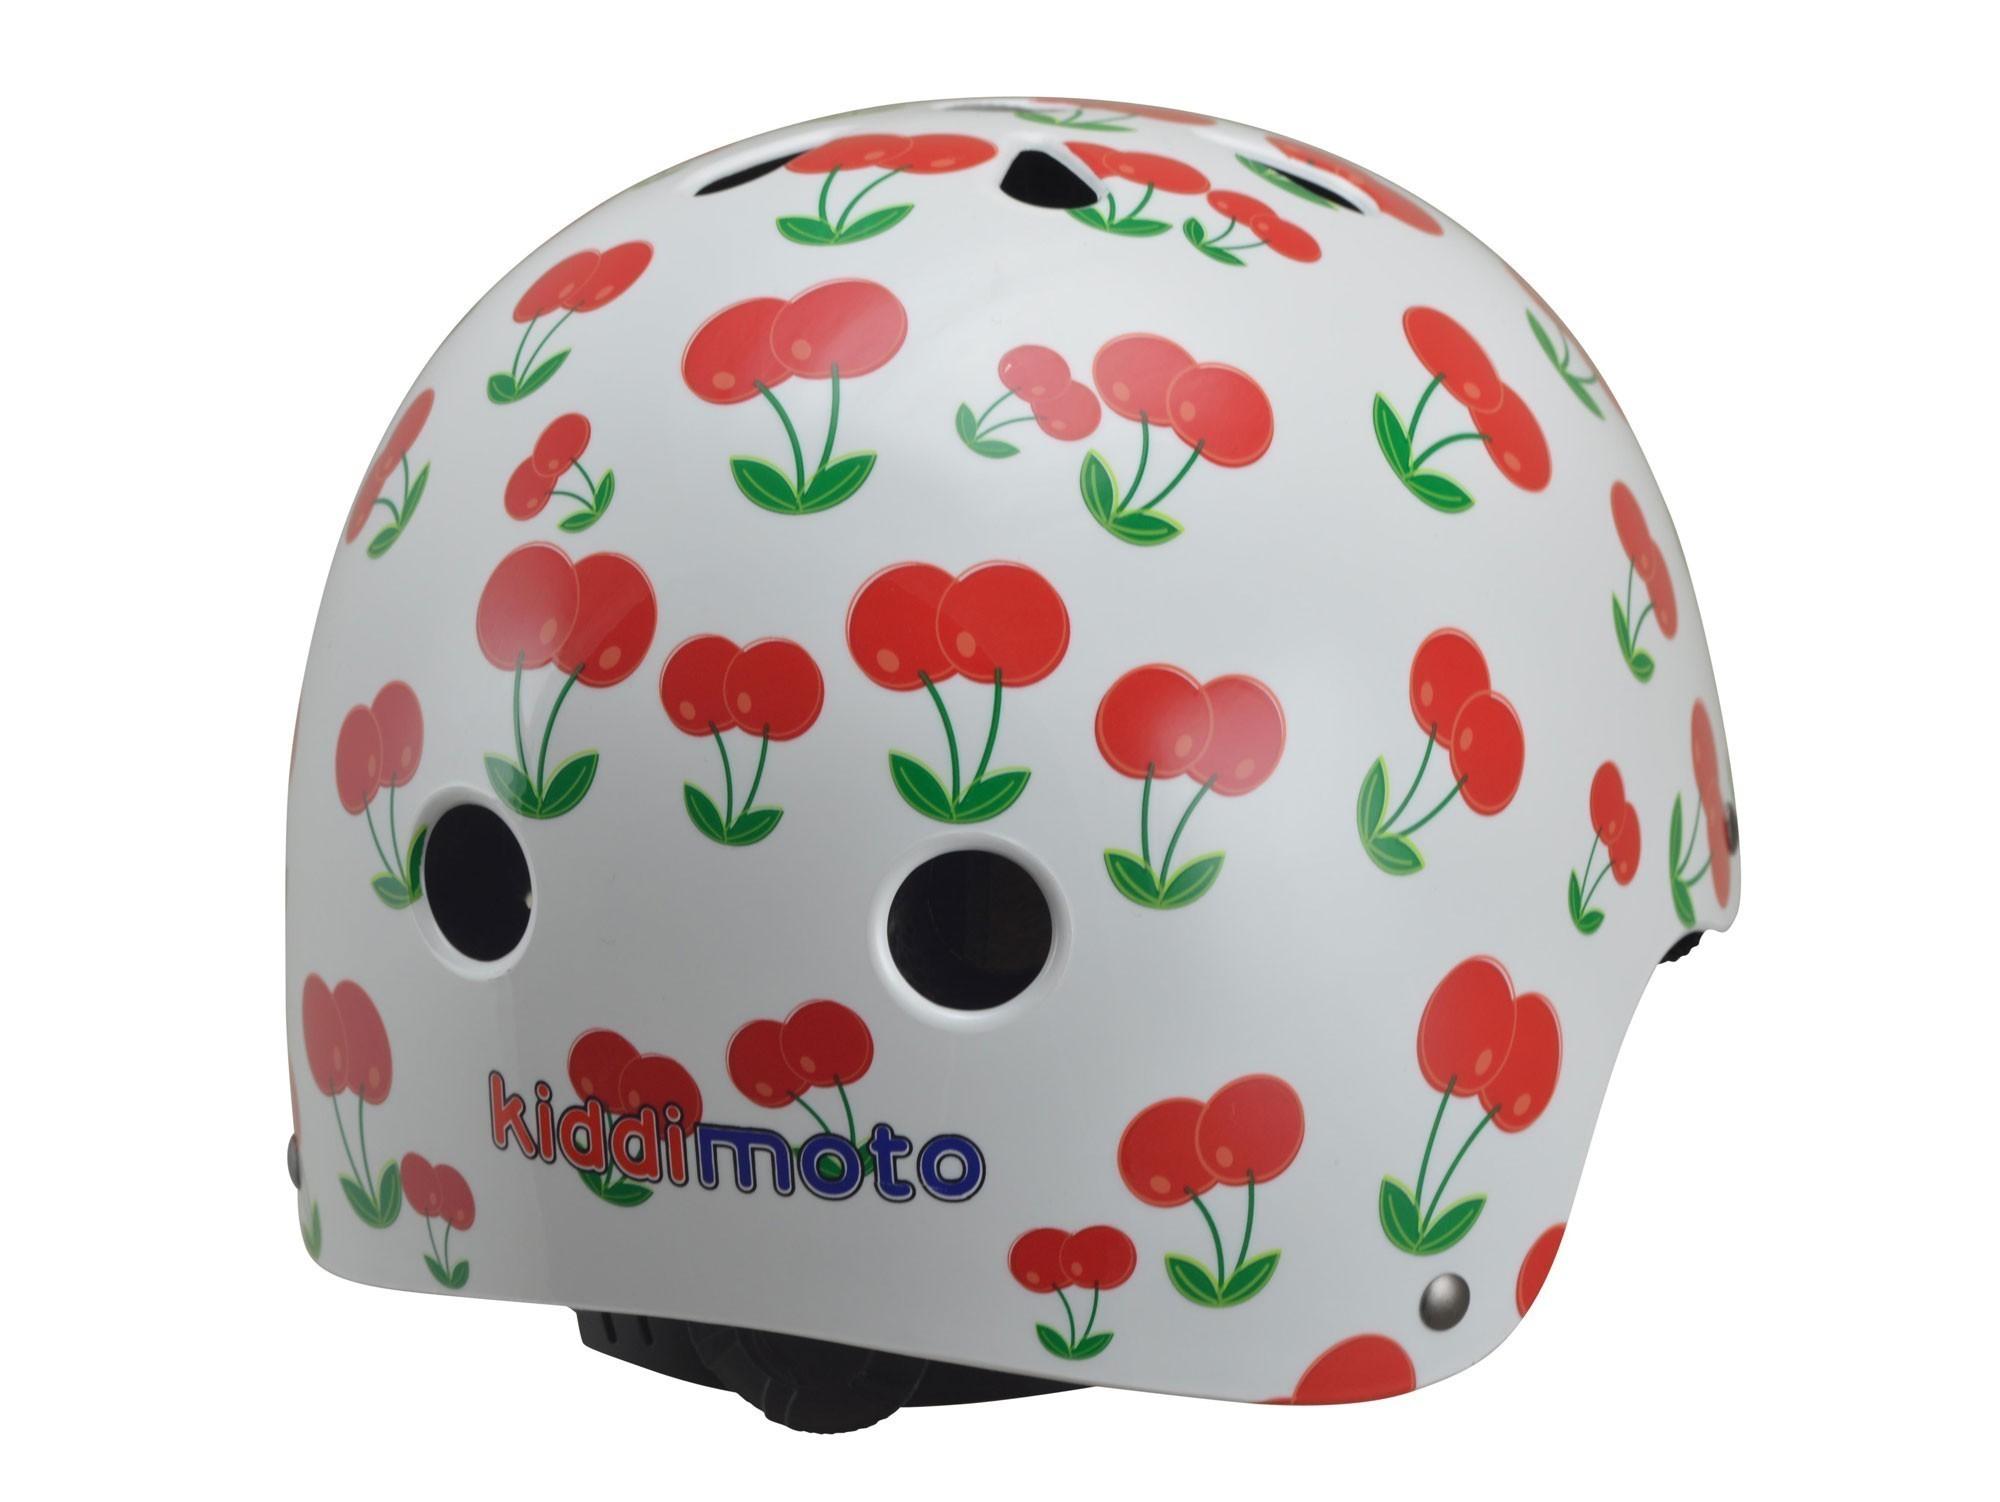 kiddimoto Fahrradhelm / Kinderhelm Größe M Cherry Bild 2